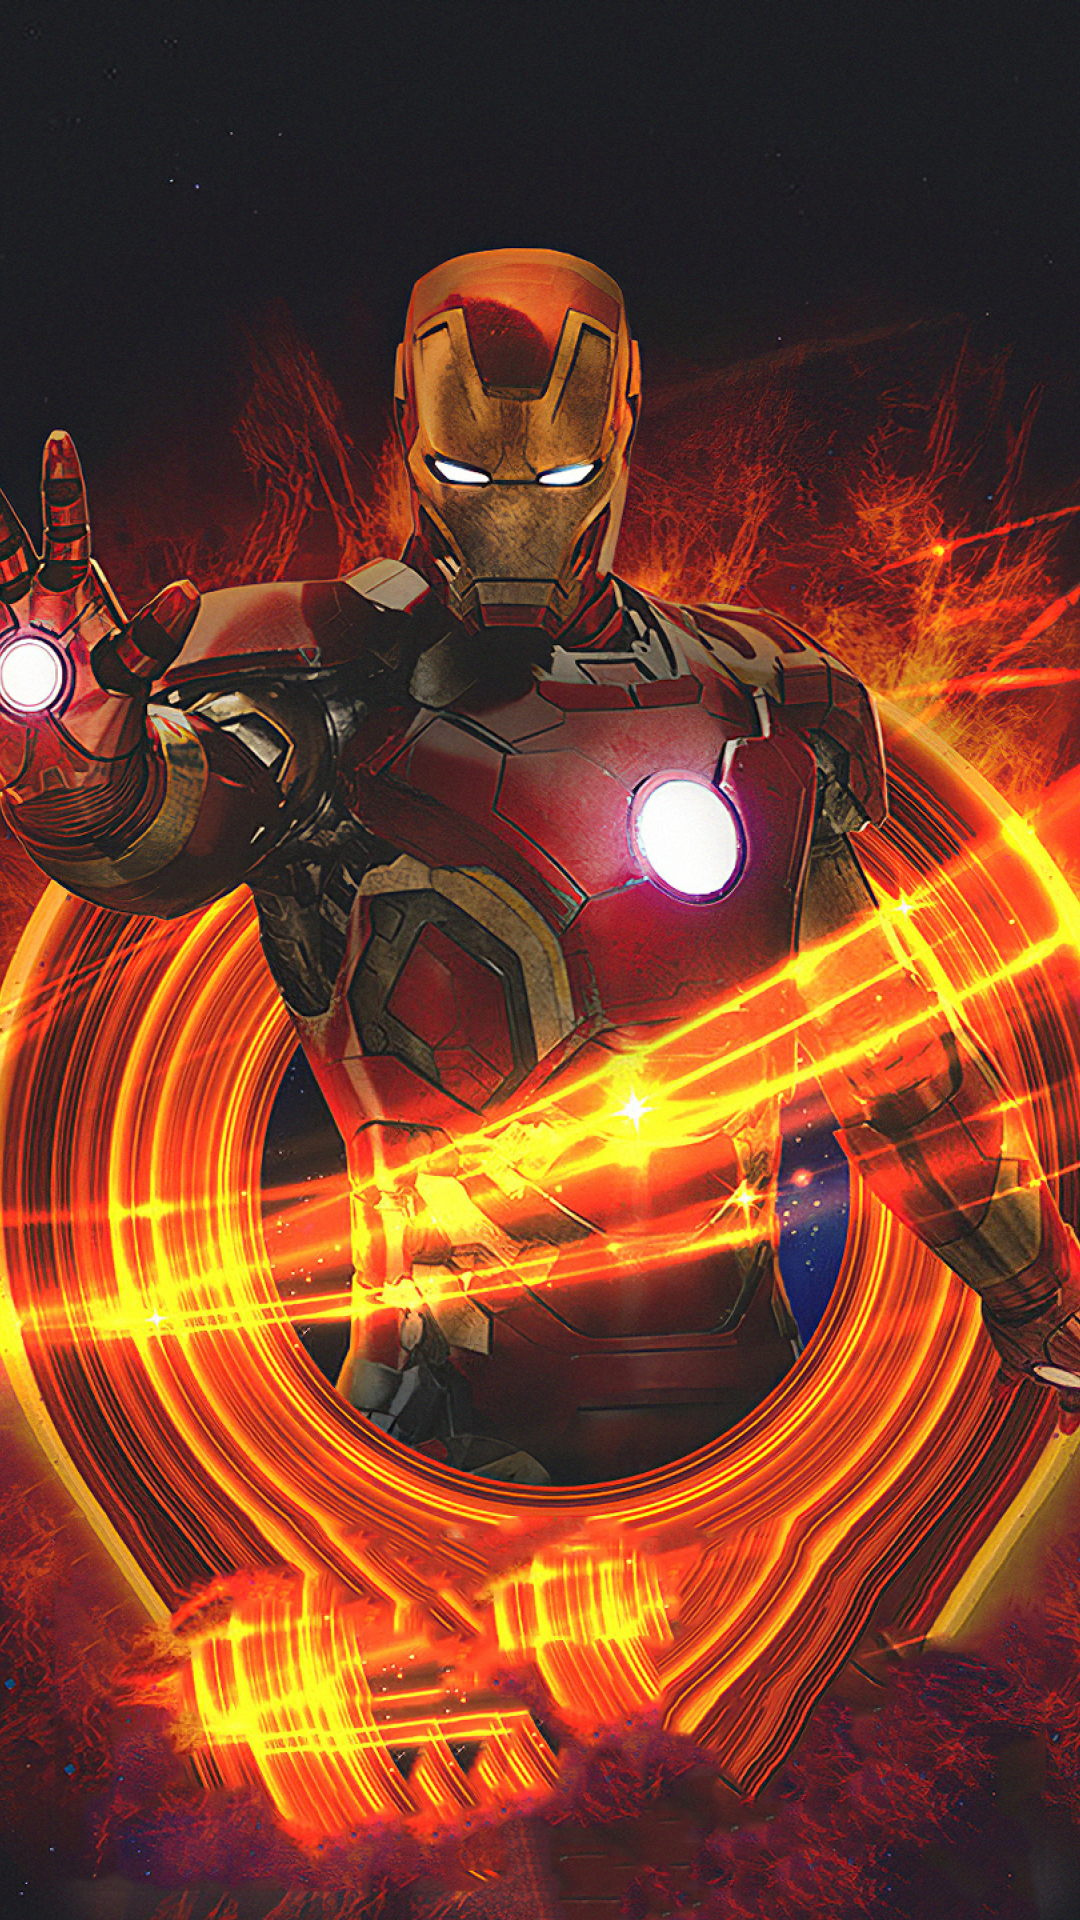 1080x1920 Marvel Iron Man Art Iphone 7, 6s, 6 Plus and ...